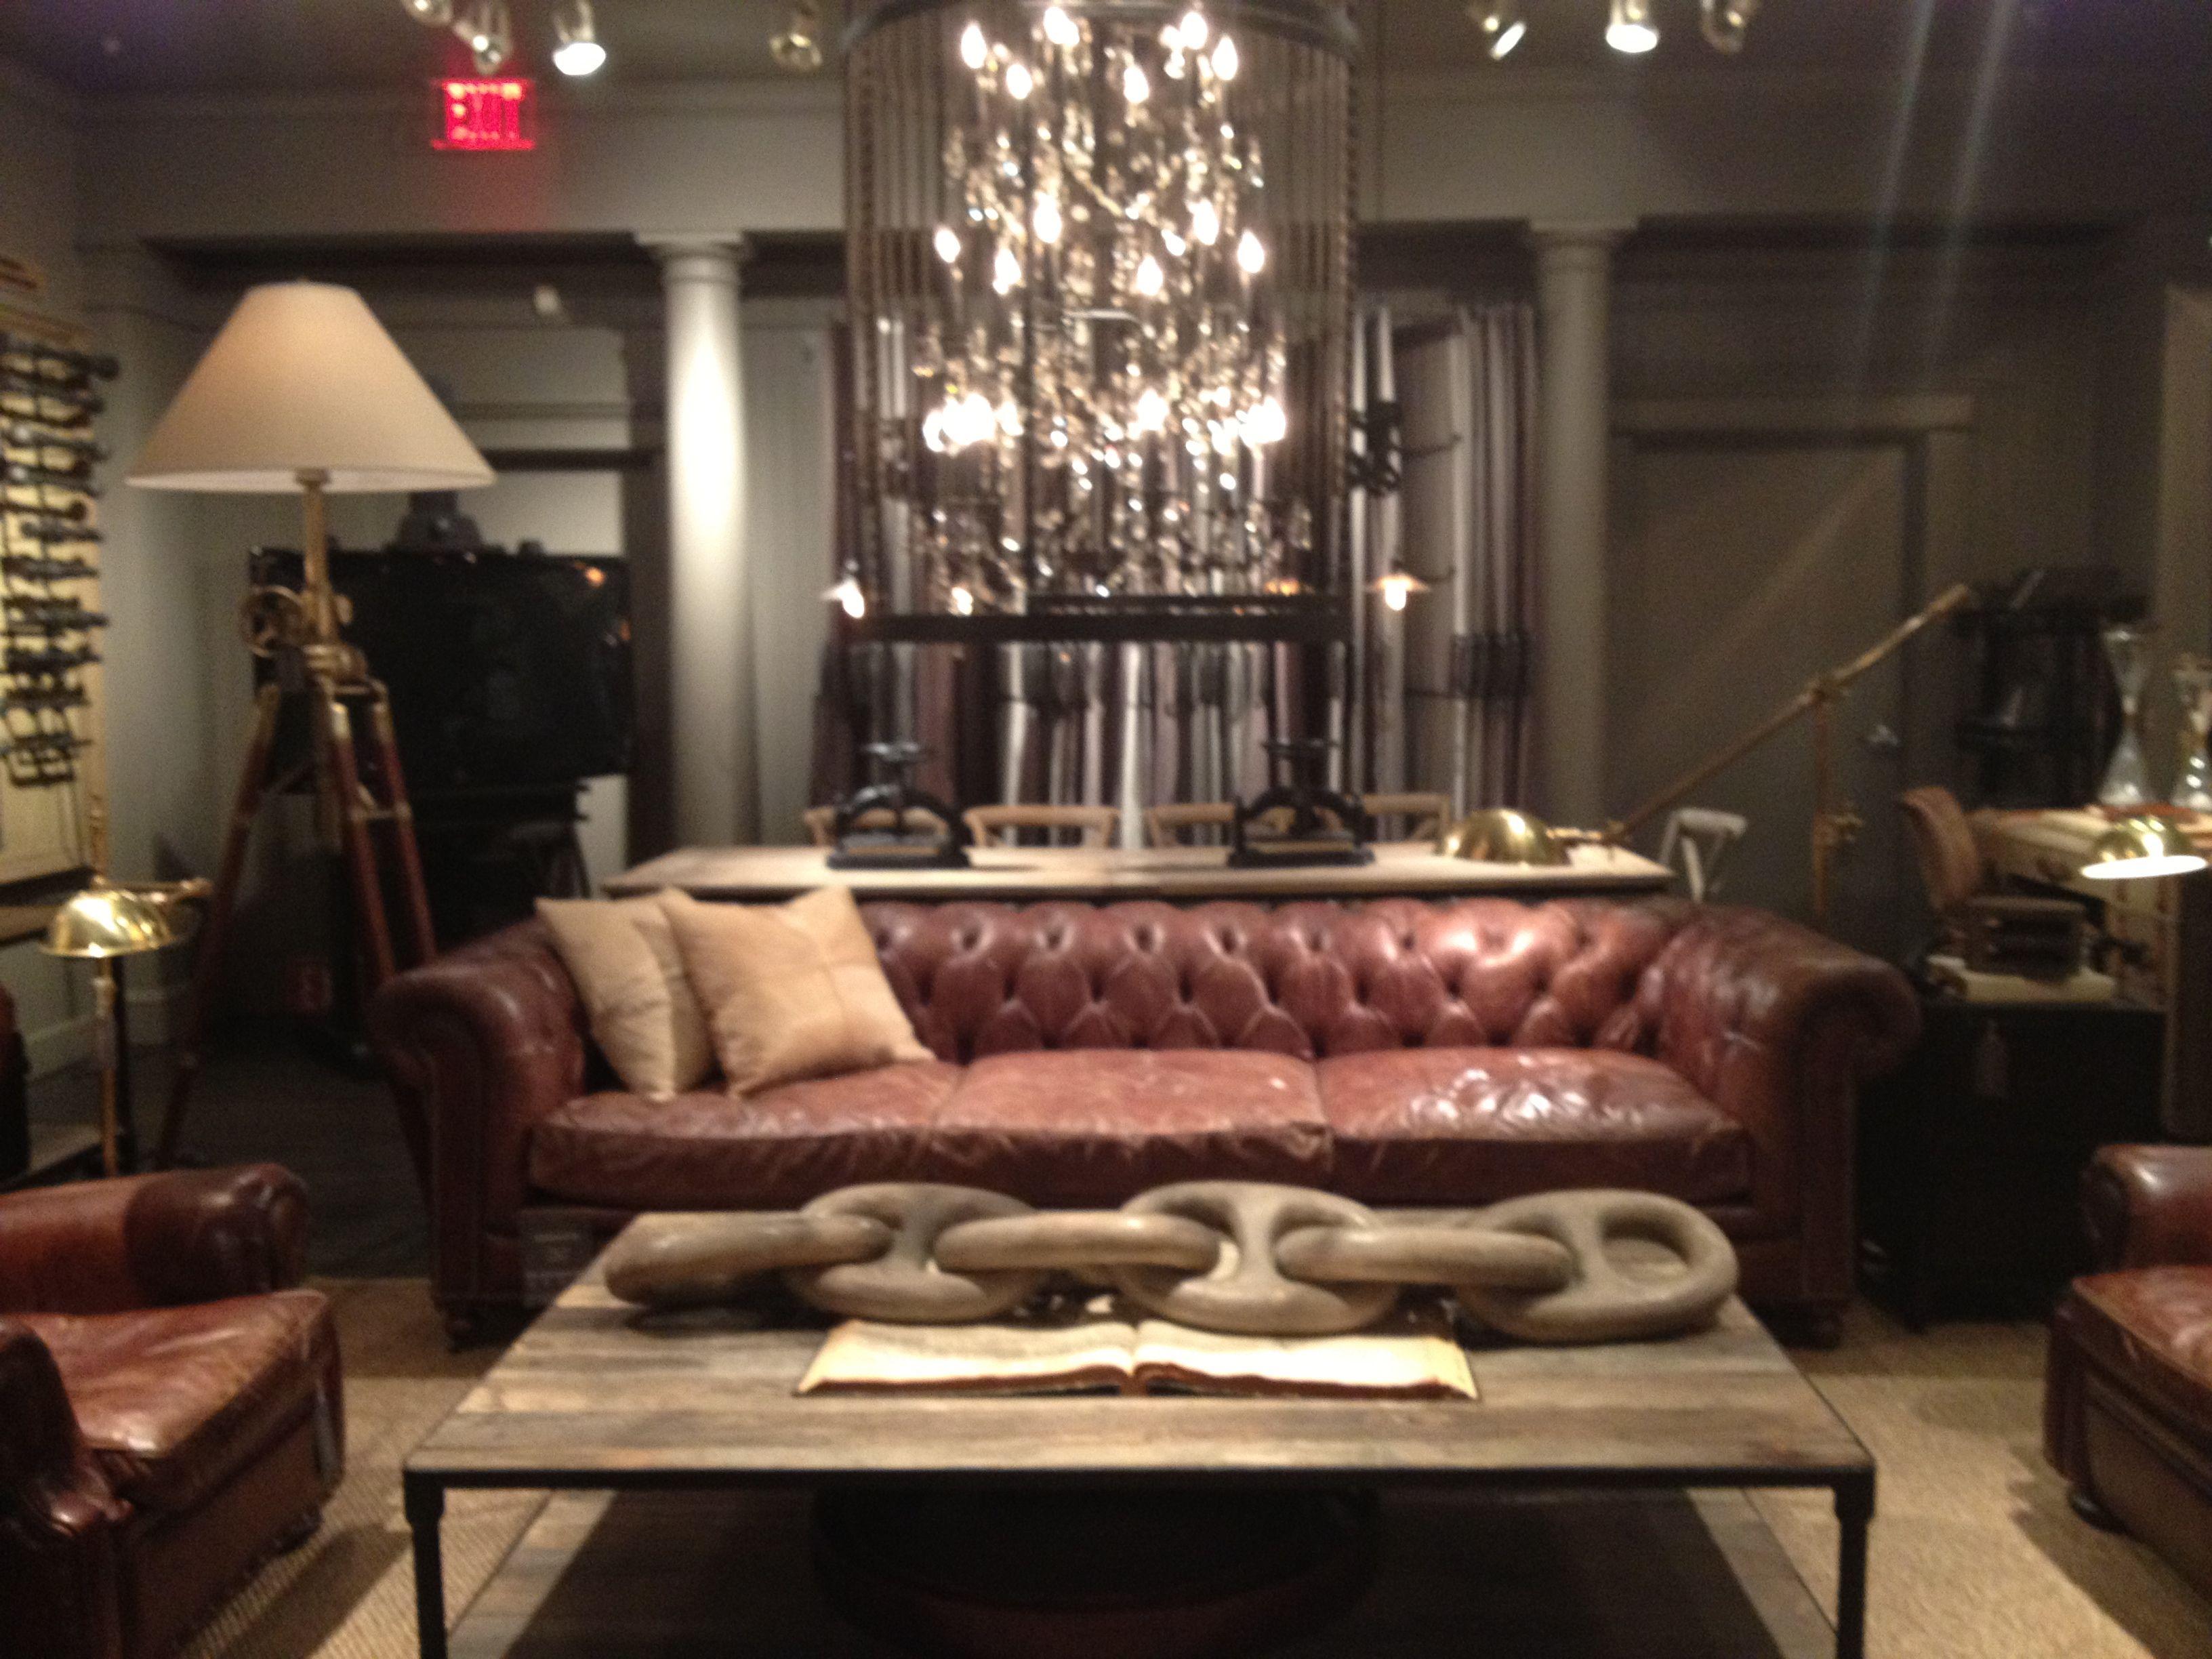 Restoration hardware living room decor i love pinterest - Restoration hardware living room ideas ...